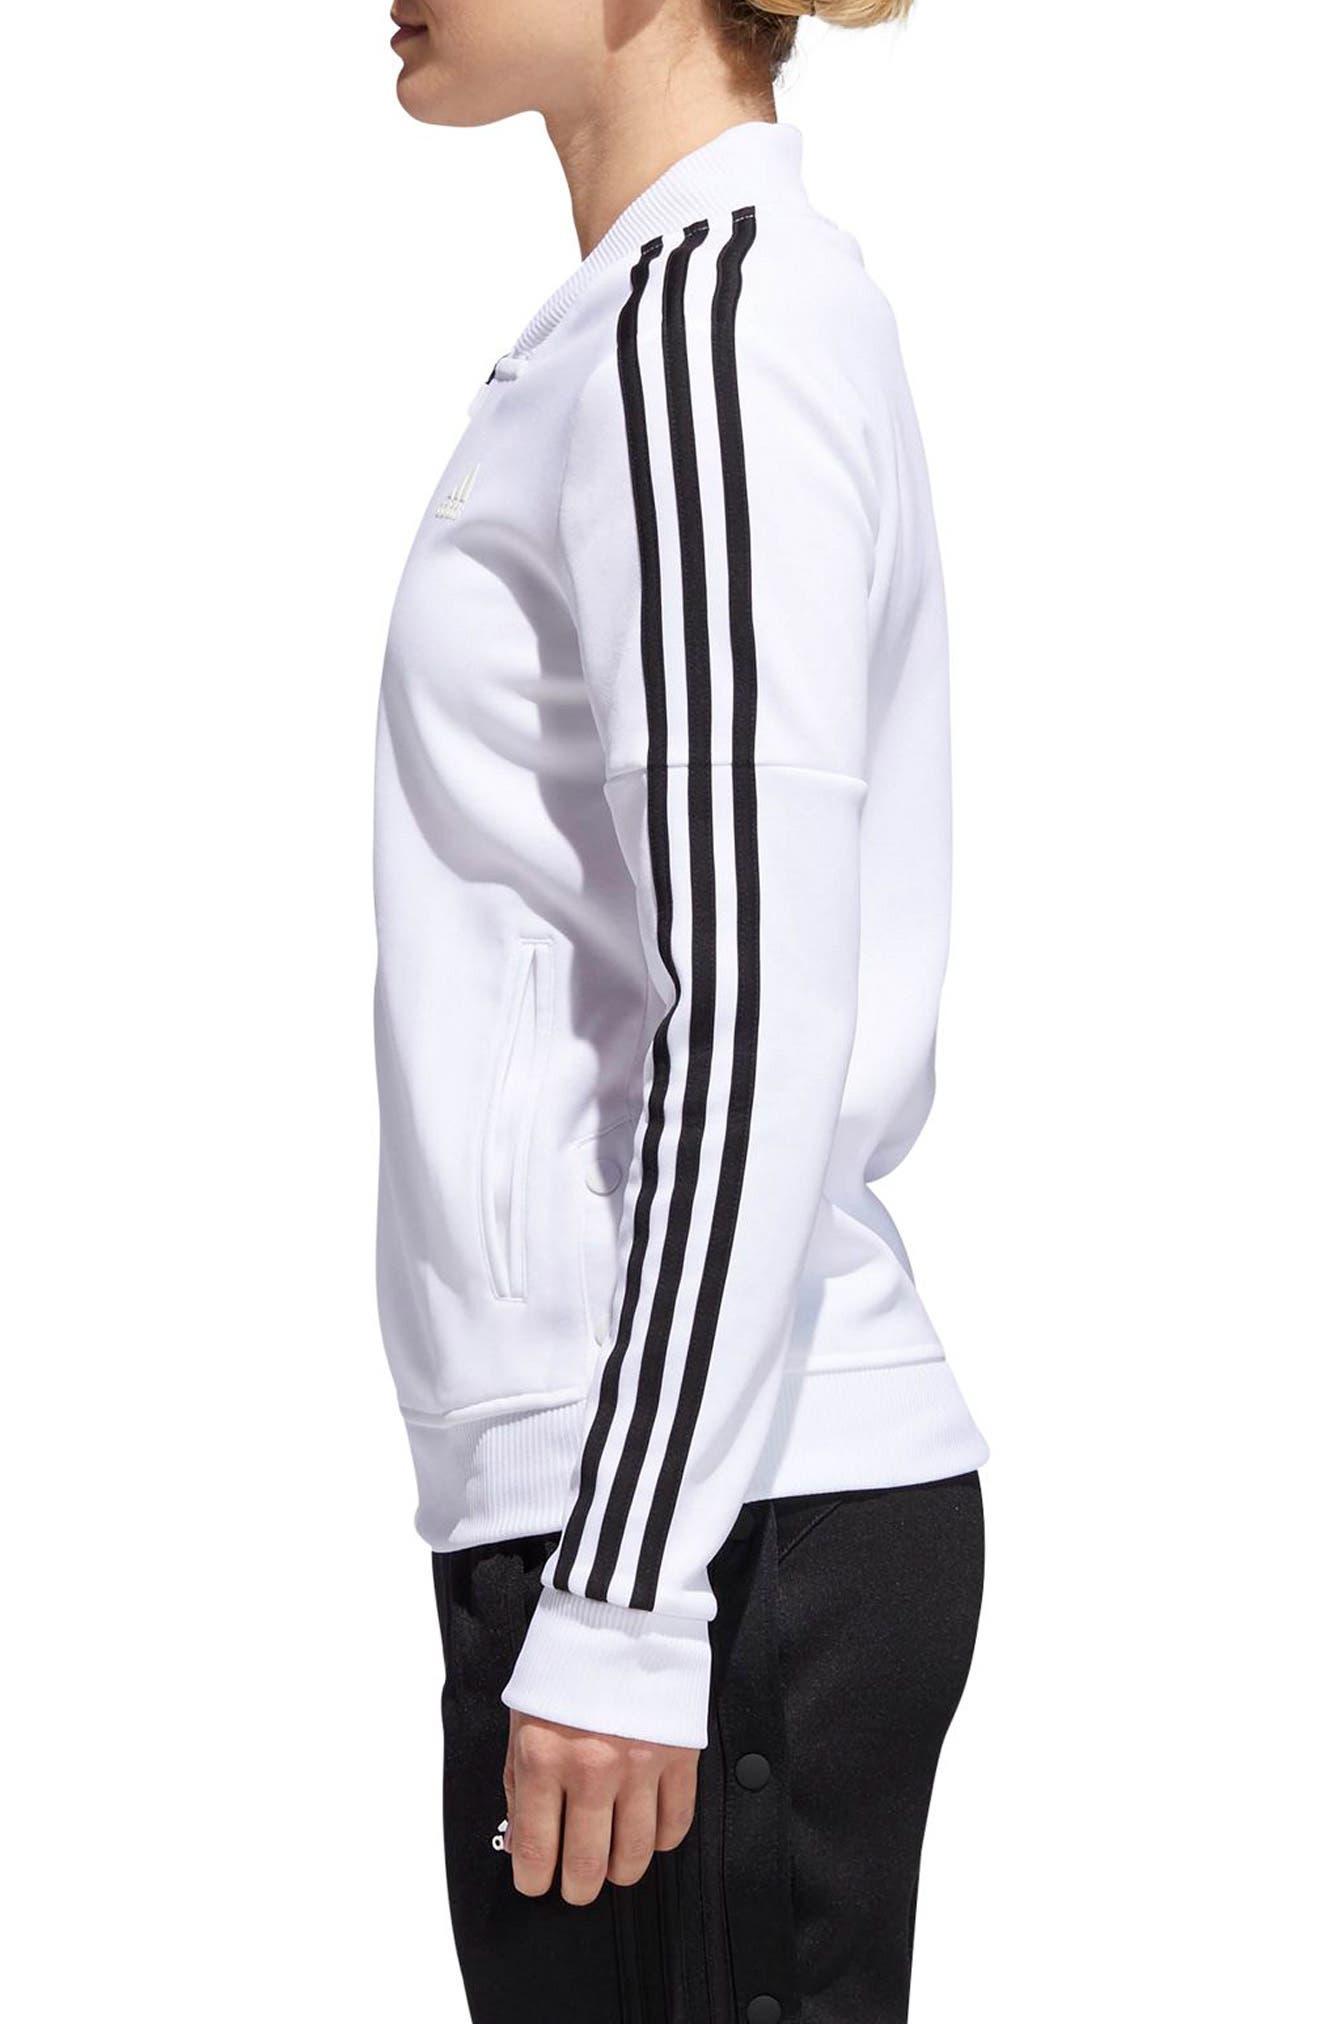 Tricot Snap It Track Jacket,                             Alternate thumbnail 3, color,                             White/ Black